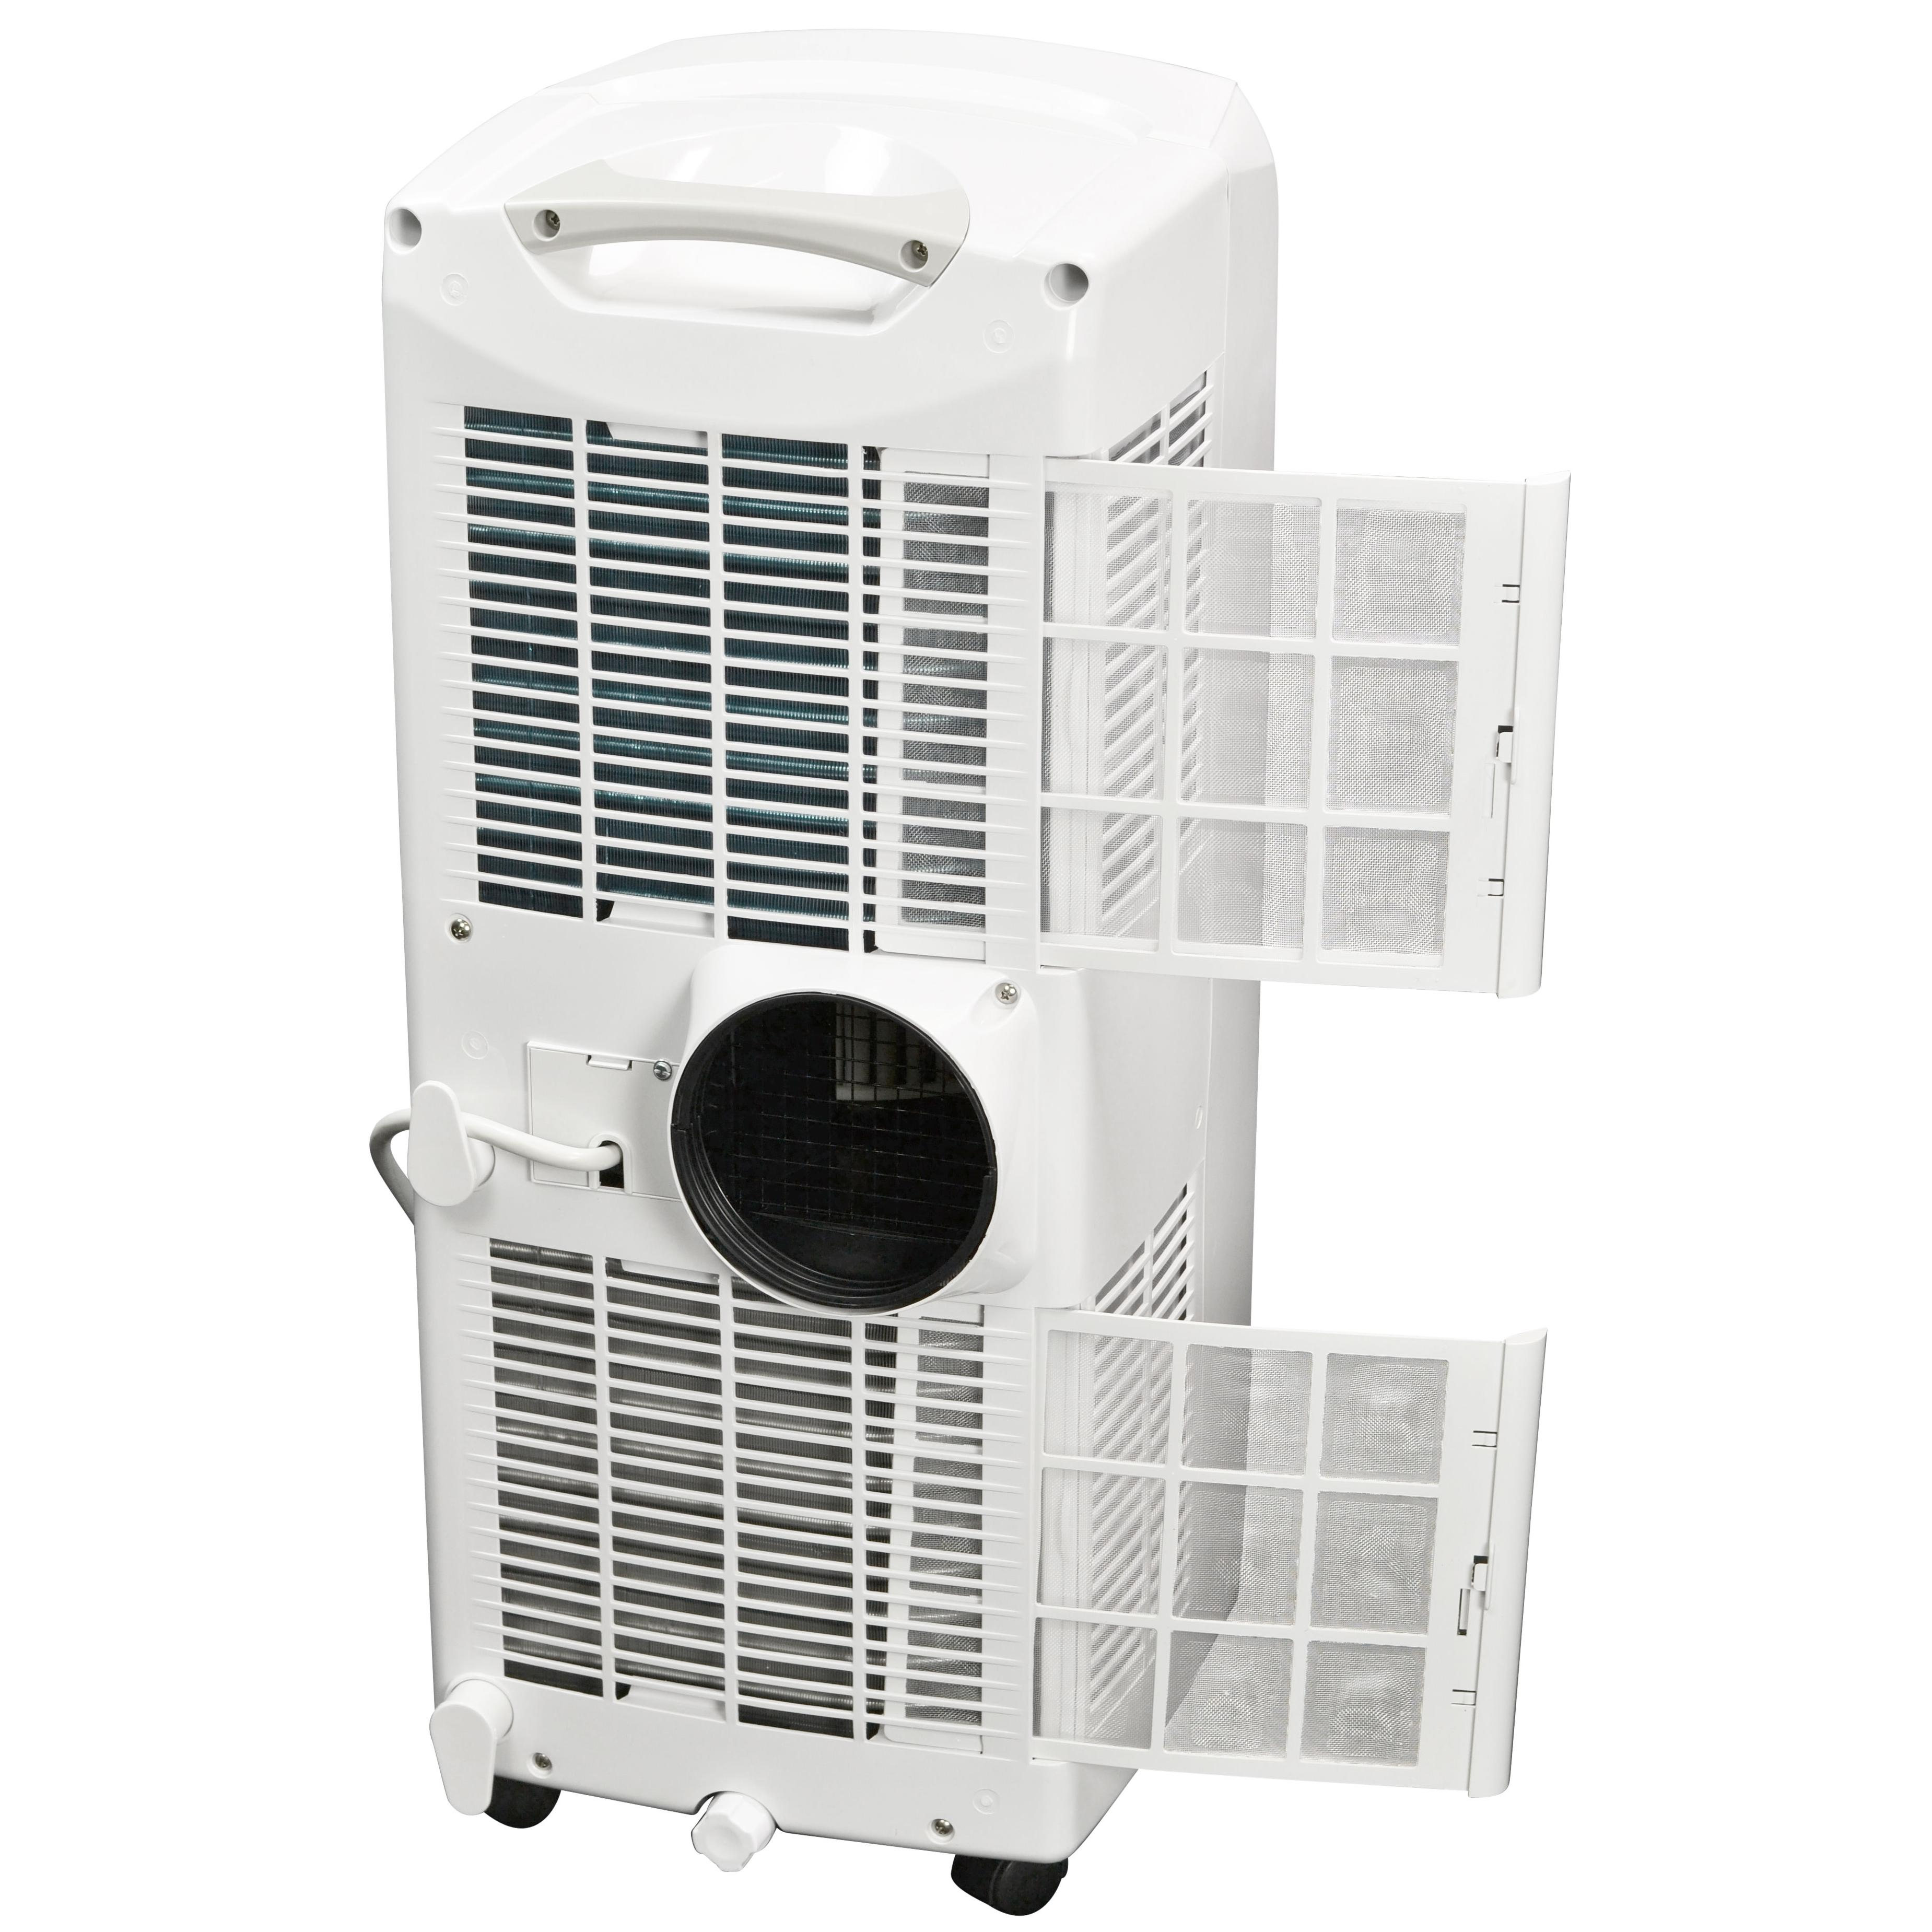 Compact 10 000 BTU Portable Air Conditioner Room Air Conditioner #405357